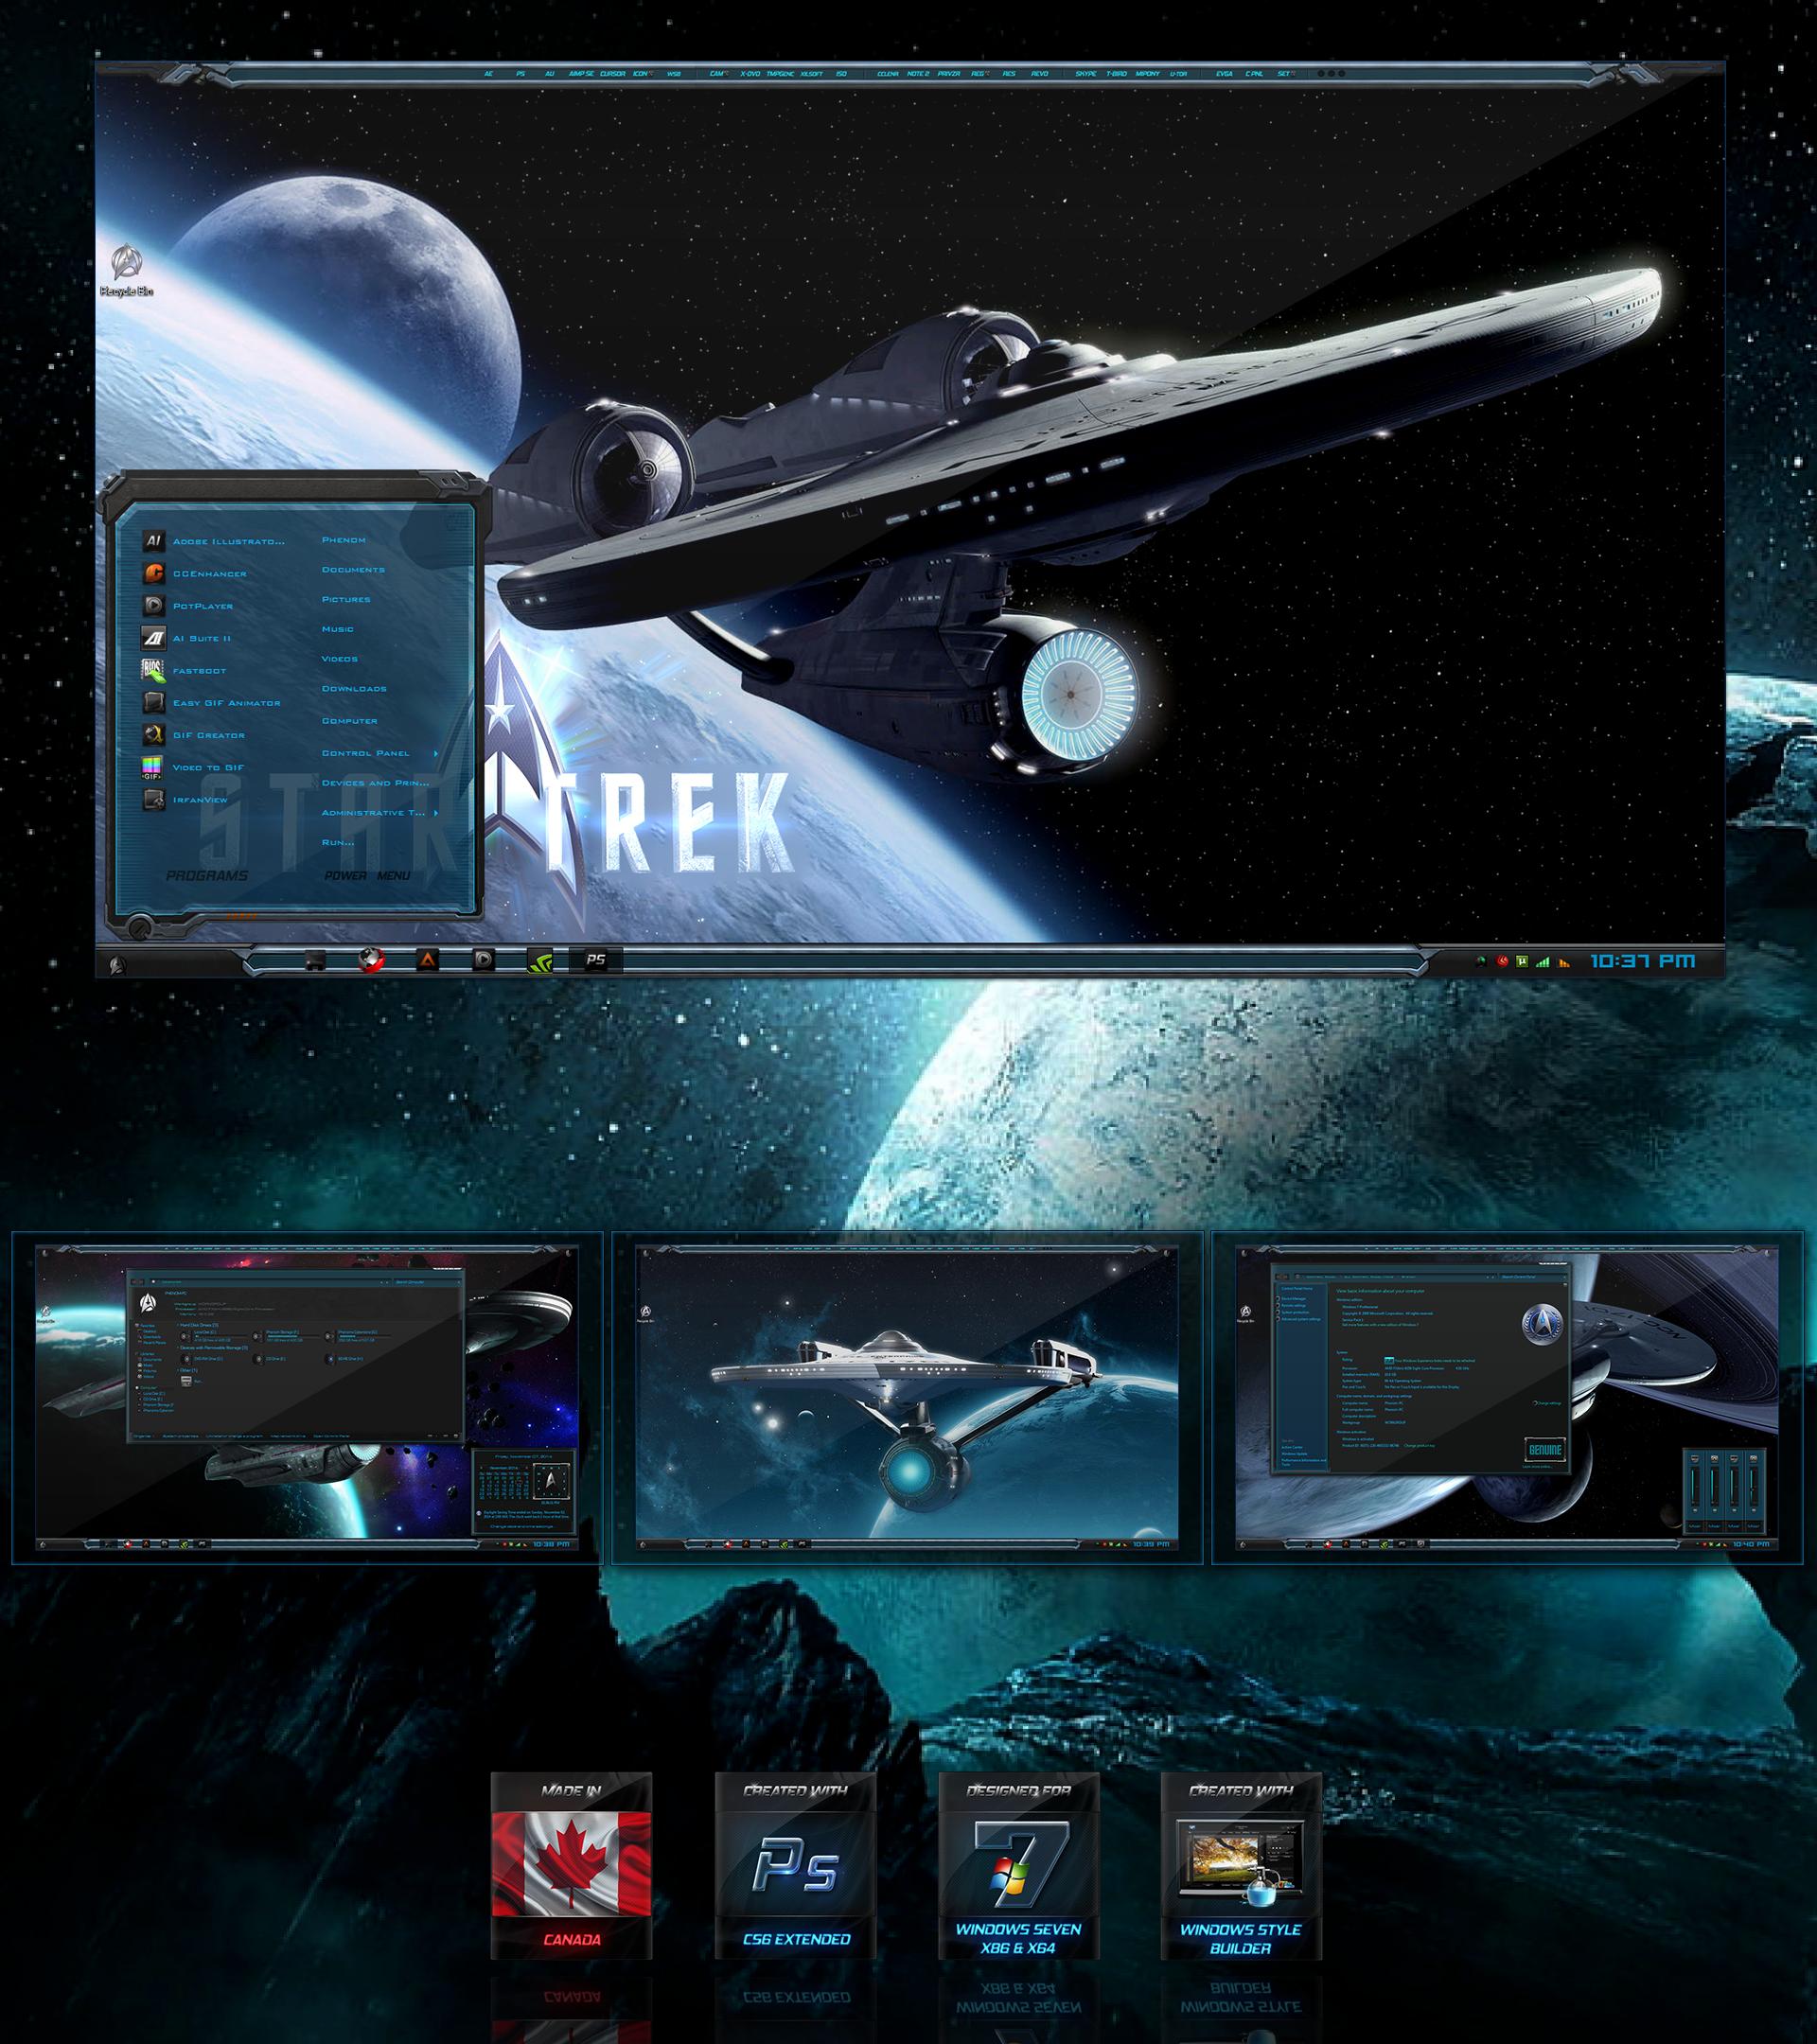 Star Trek Control Panel Wallpaper